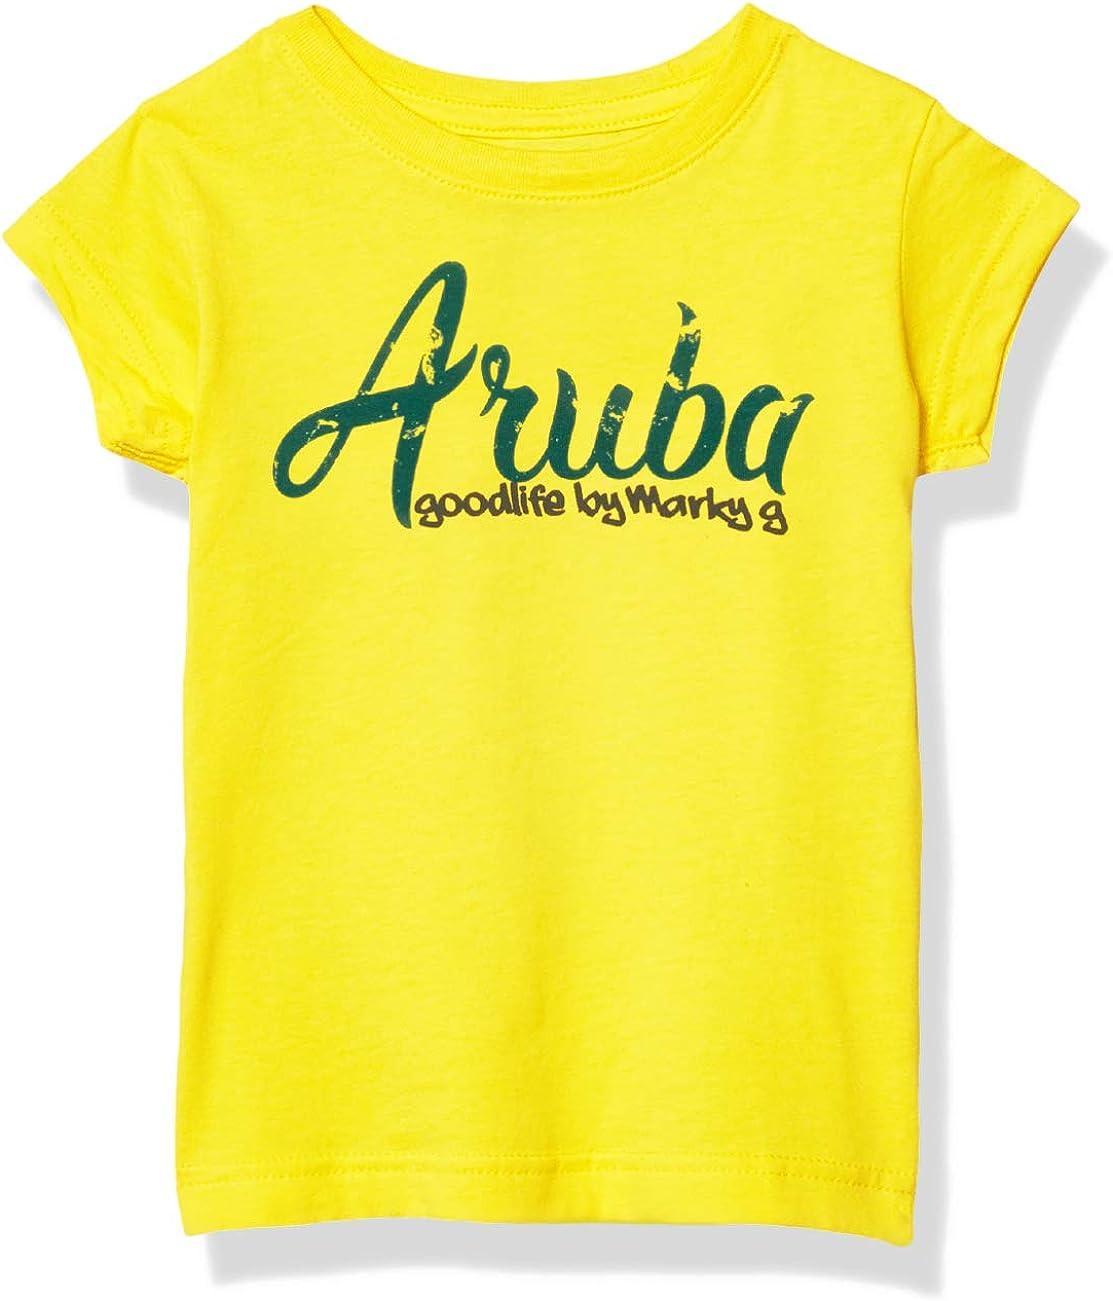 Marky G Apparel Girls' Printed Aruba Graphic Cotton Jersey Short Sleeve Tee